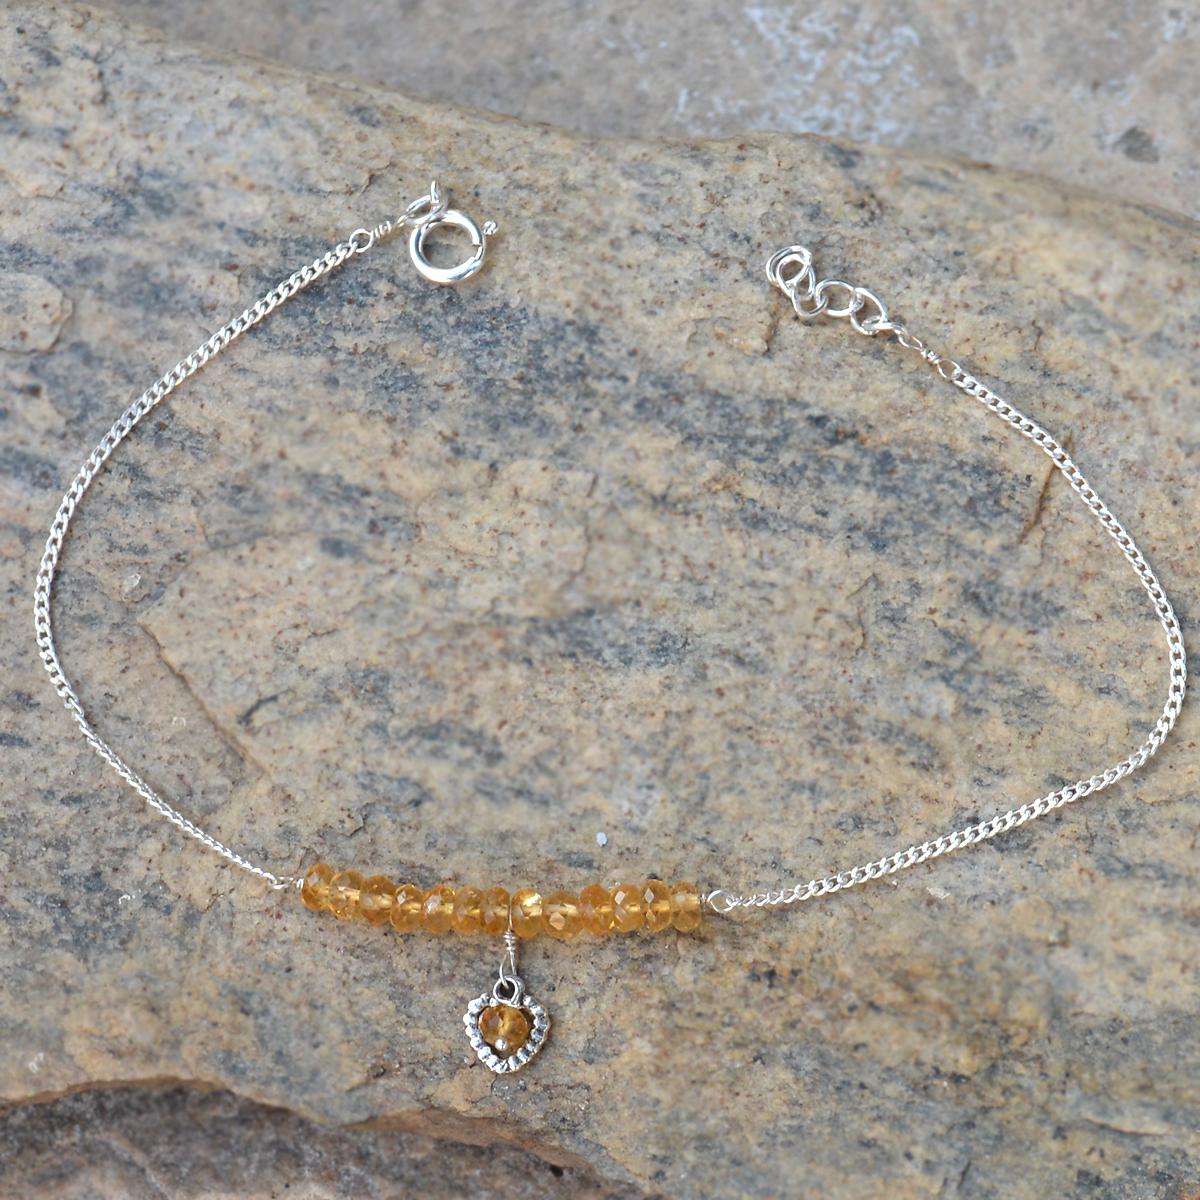 Handmade Jewelry Manufacturer 3 mm Round Citrine Gemstone 925 Sterling Silver Single Piece Anklet Jaipur Rajasthan India